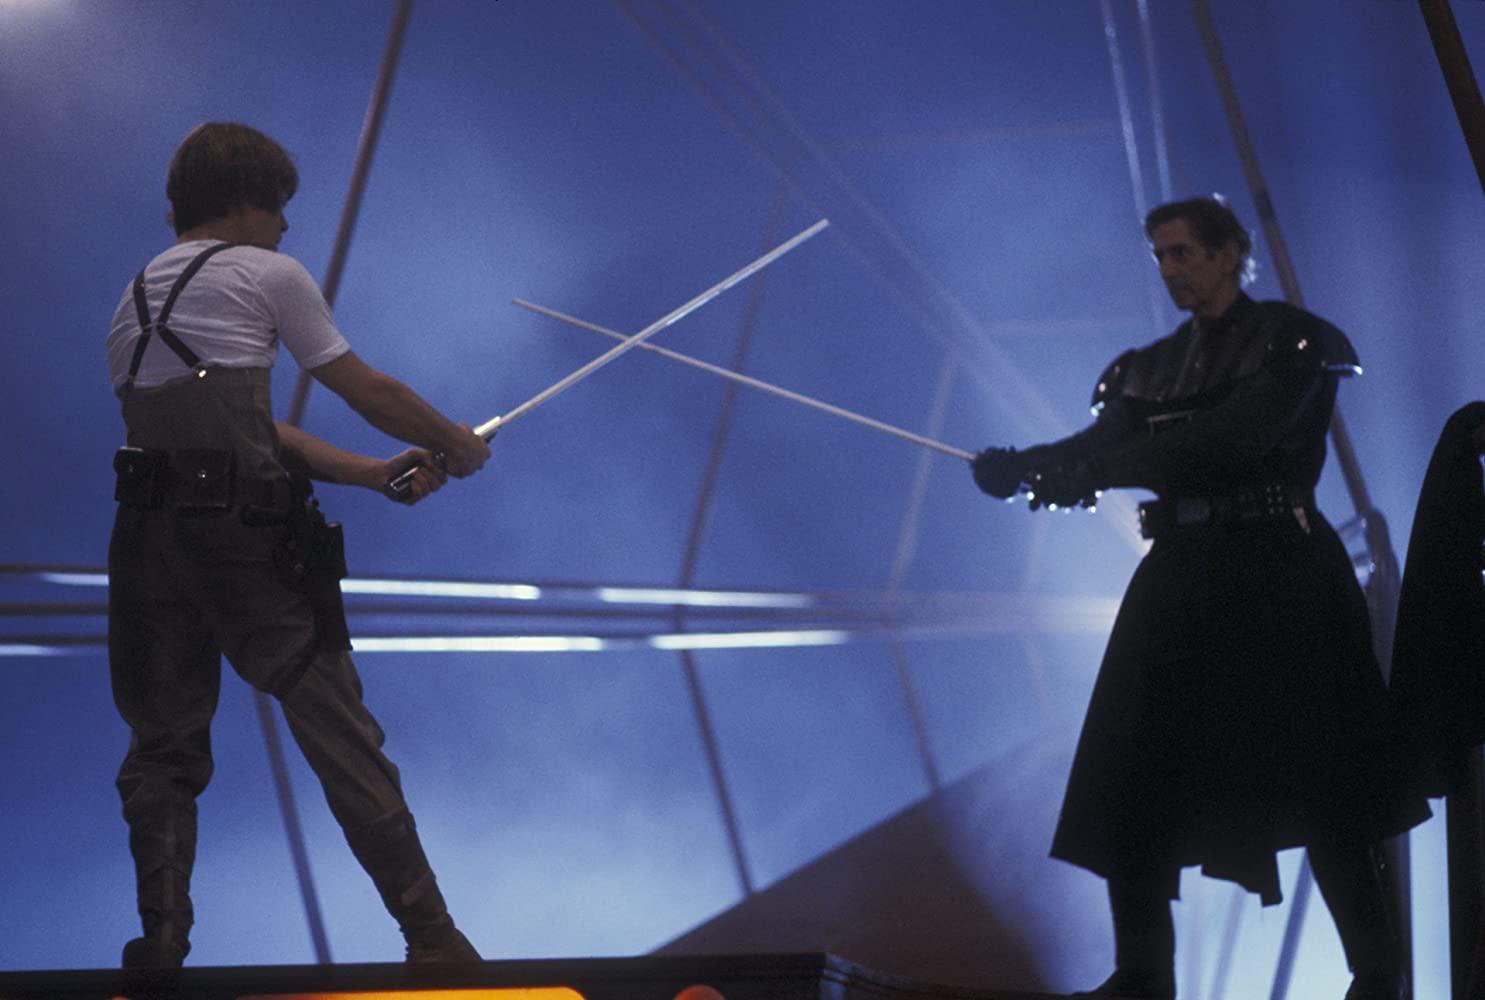 Mark Hamill and Bob Anderson in Star Wars Episode V - The Empire Strikes Back 1980